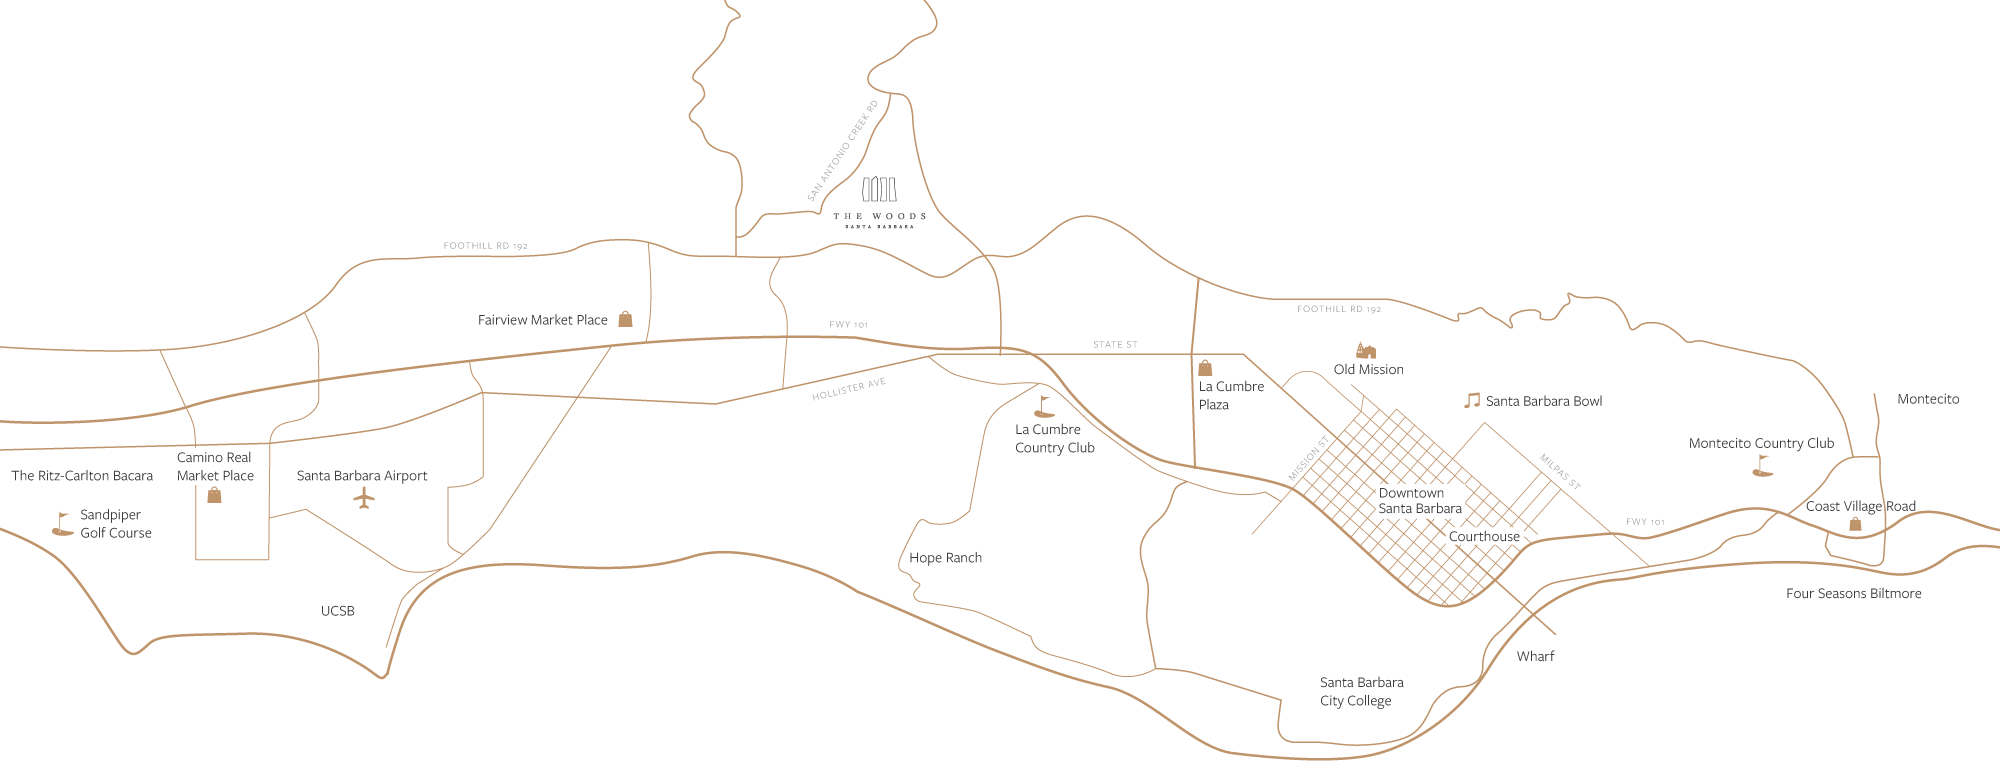 santa-barbara-city